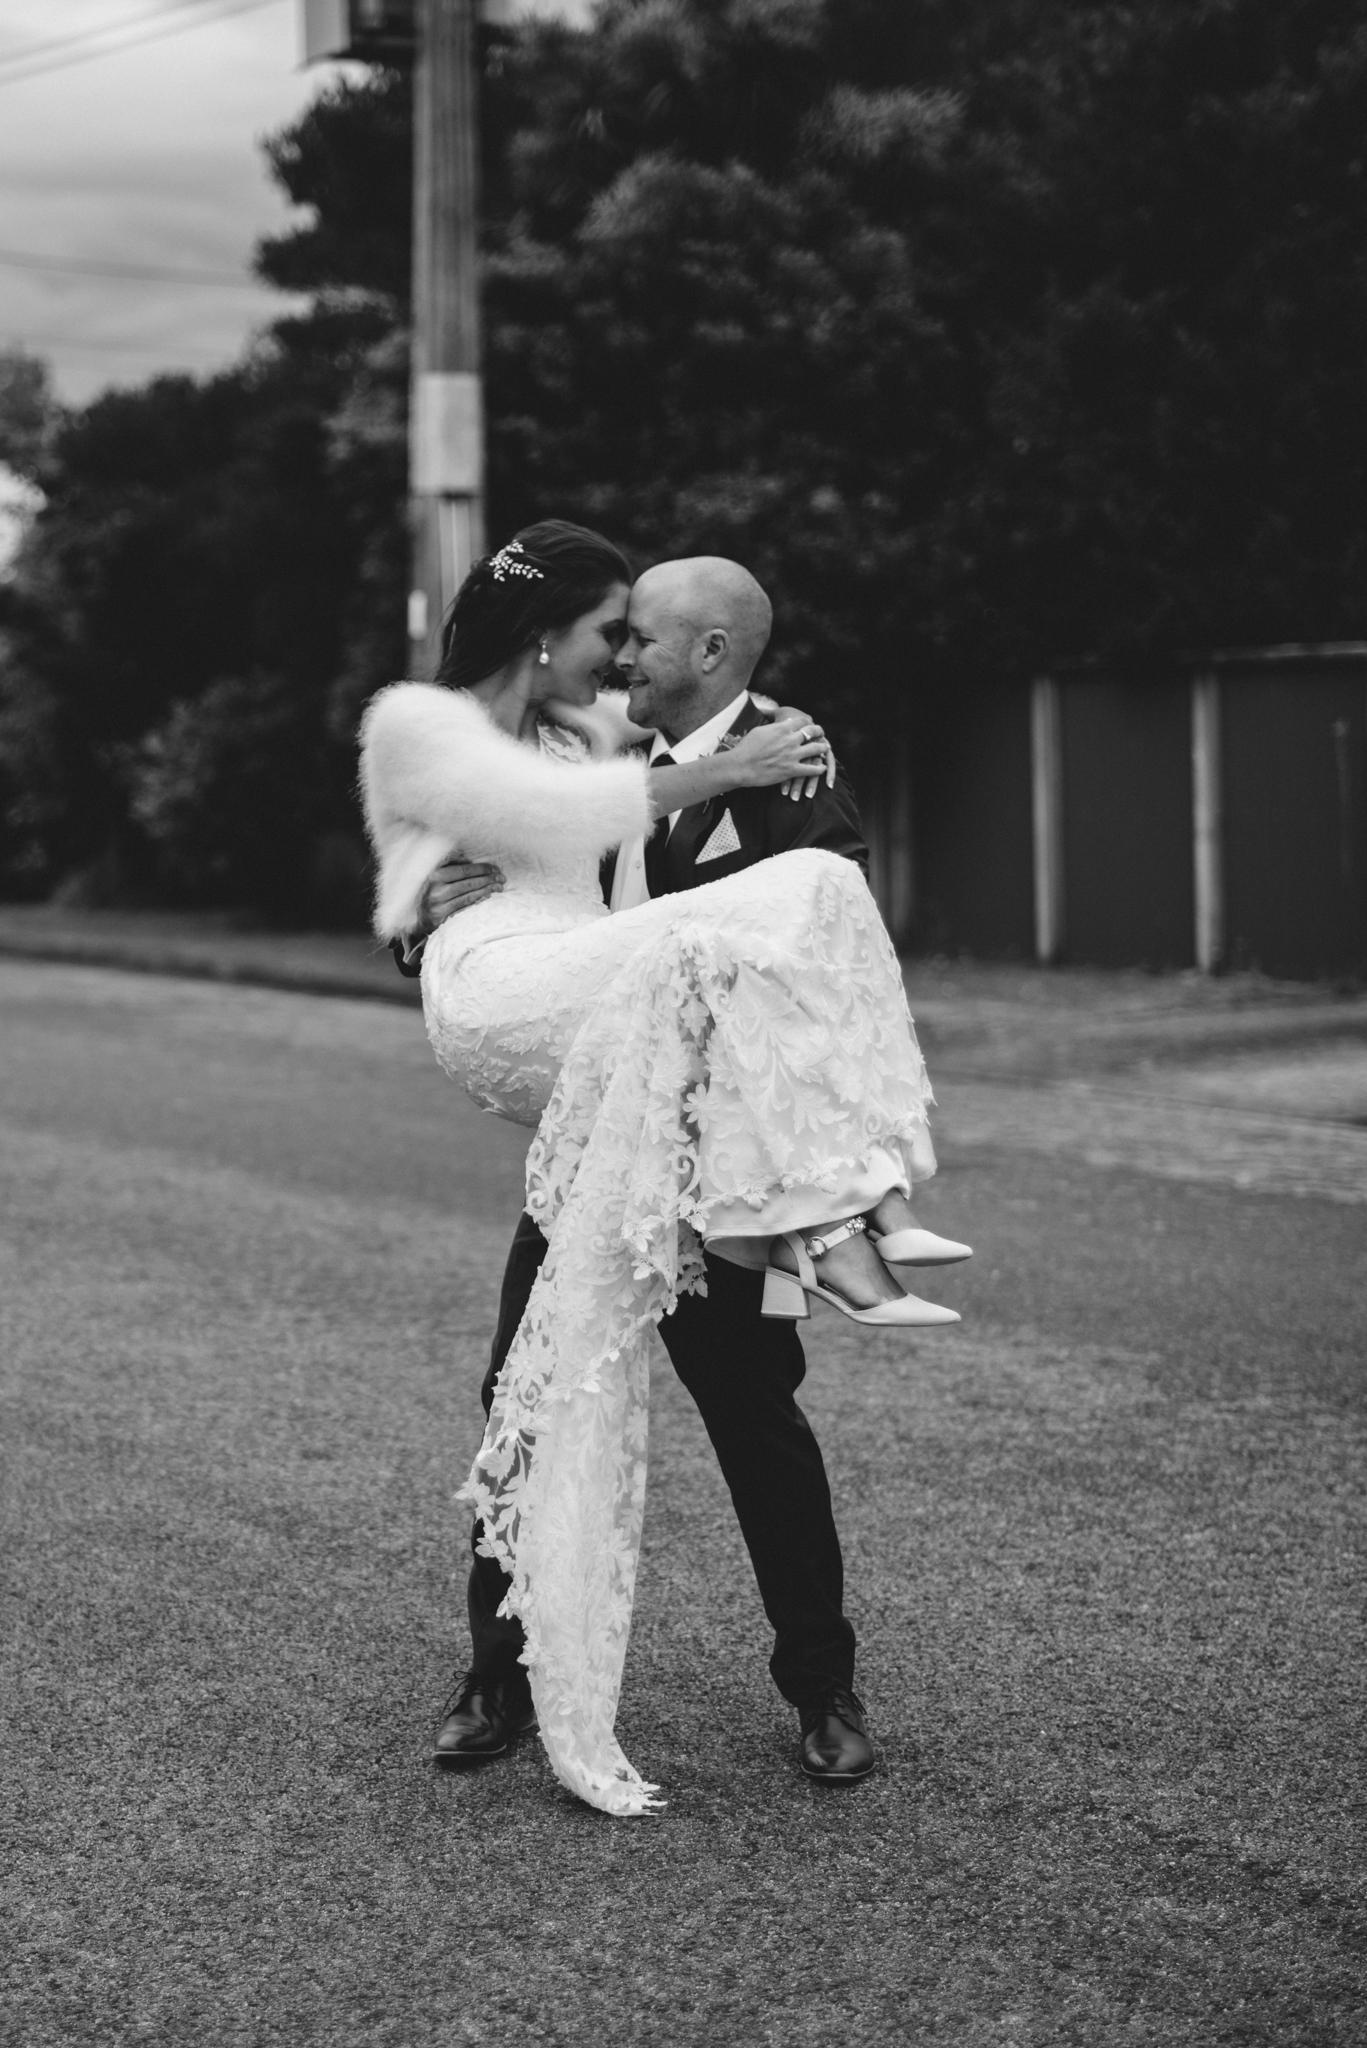 LOVELENSCAPES PHOTOGRAPHY • VISUAL POETRY • NEW ZEALAND WEDDING PHOTOGRAPHER • AUSTRALIAN WEDDING PHOTOGRAPHER • BRISBANE • MELBOURNE • SYDNEY • HOBART • TARUREKA ESTATE • ANNA CAMPBELL • 145.jpg